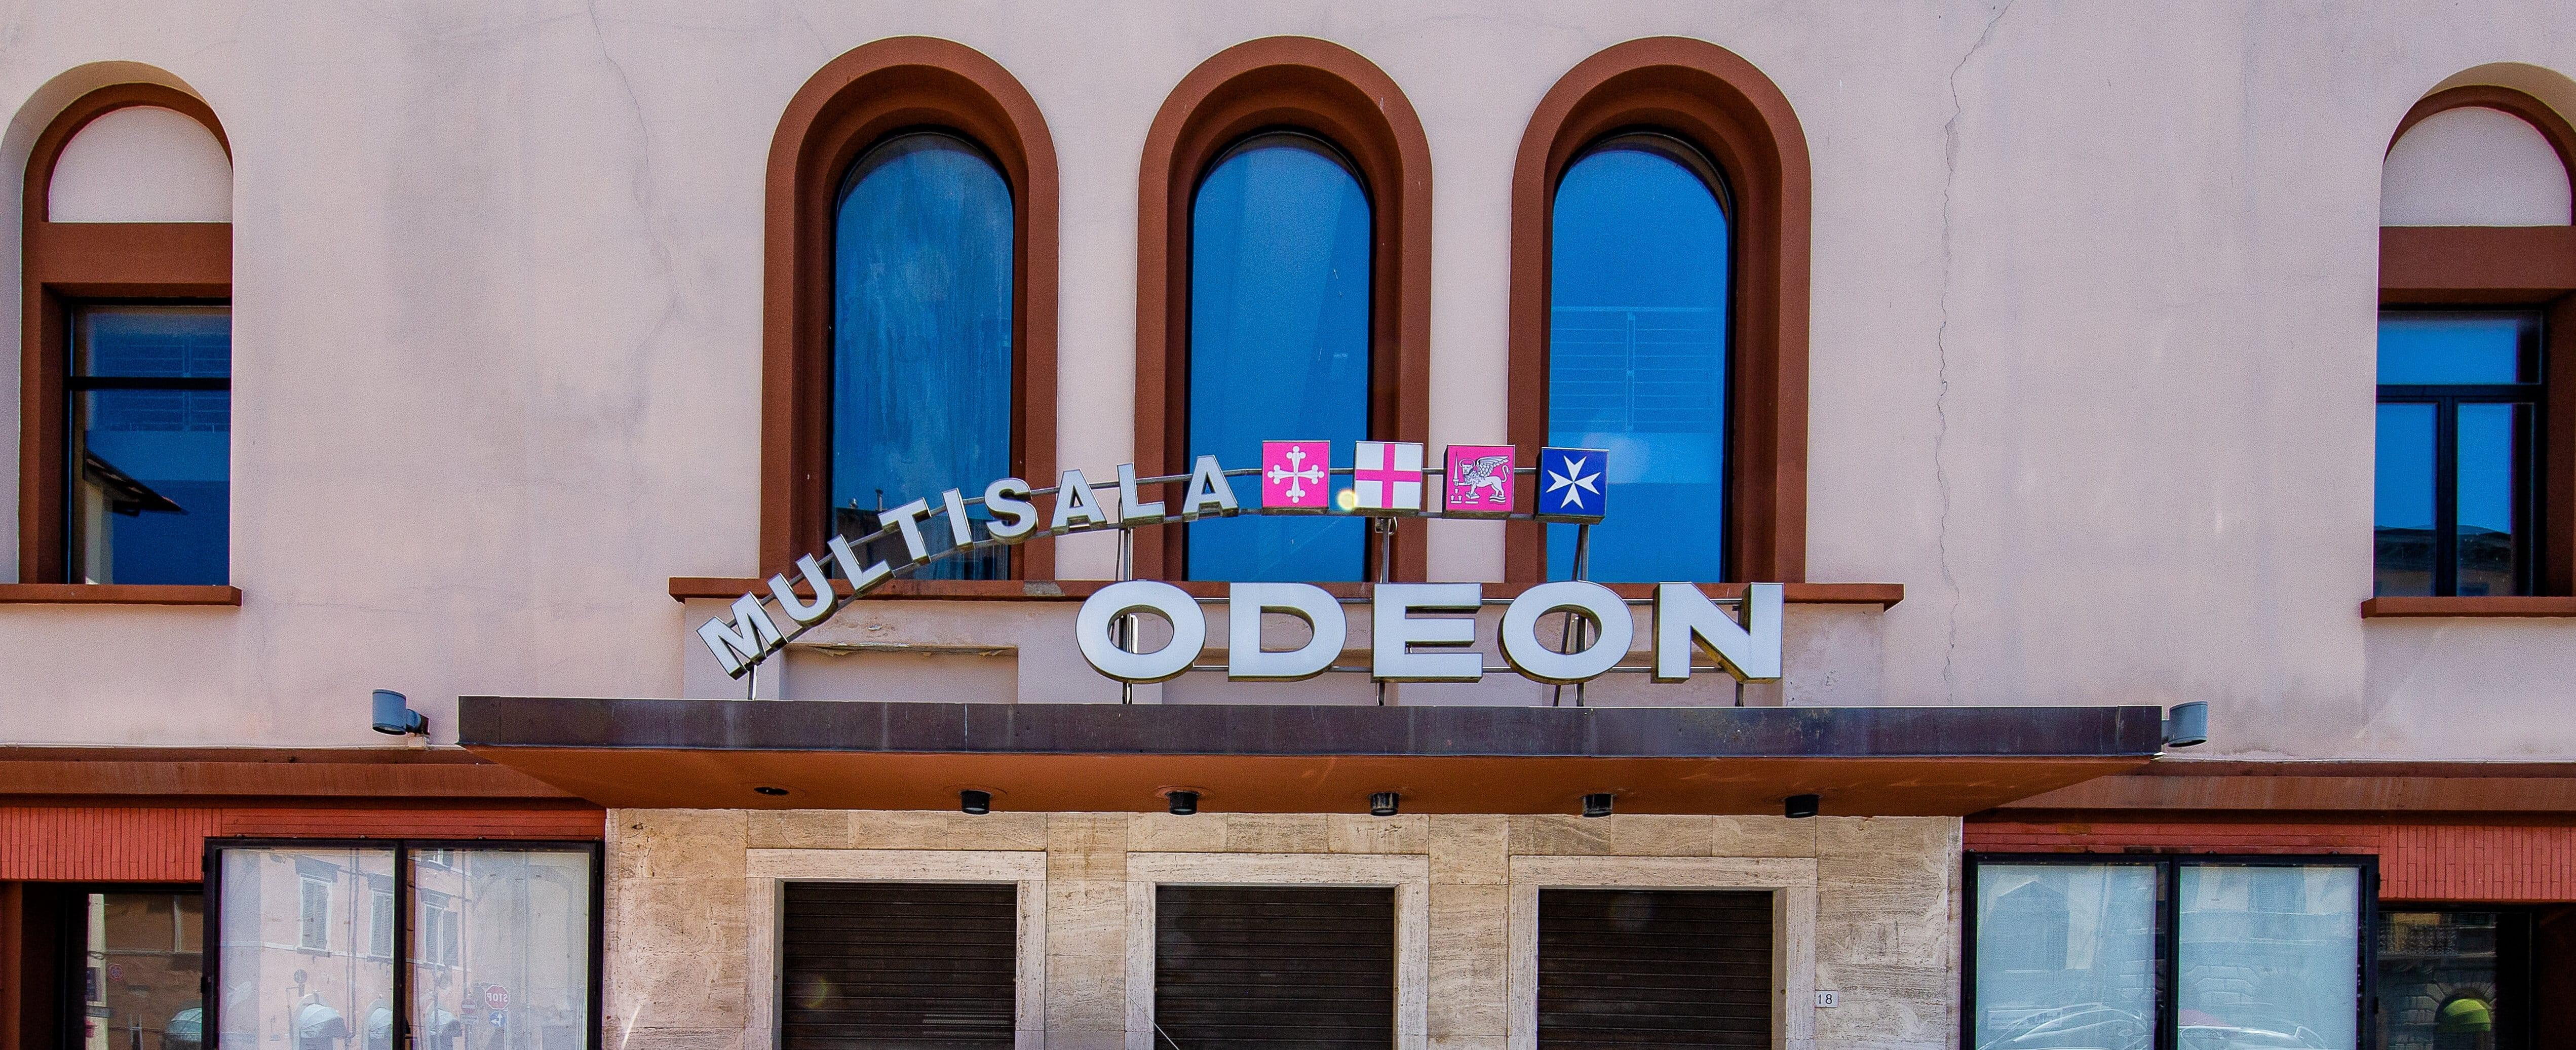 Cinema Odeon (M. Cerrai, Comune di Pisa)